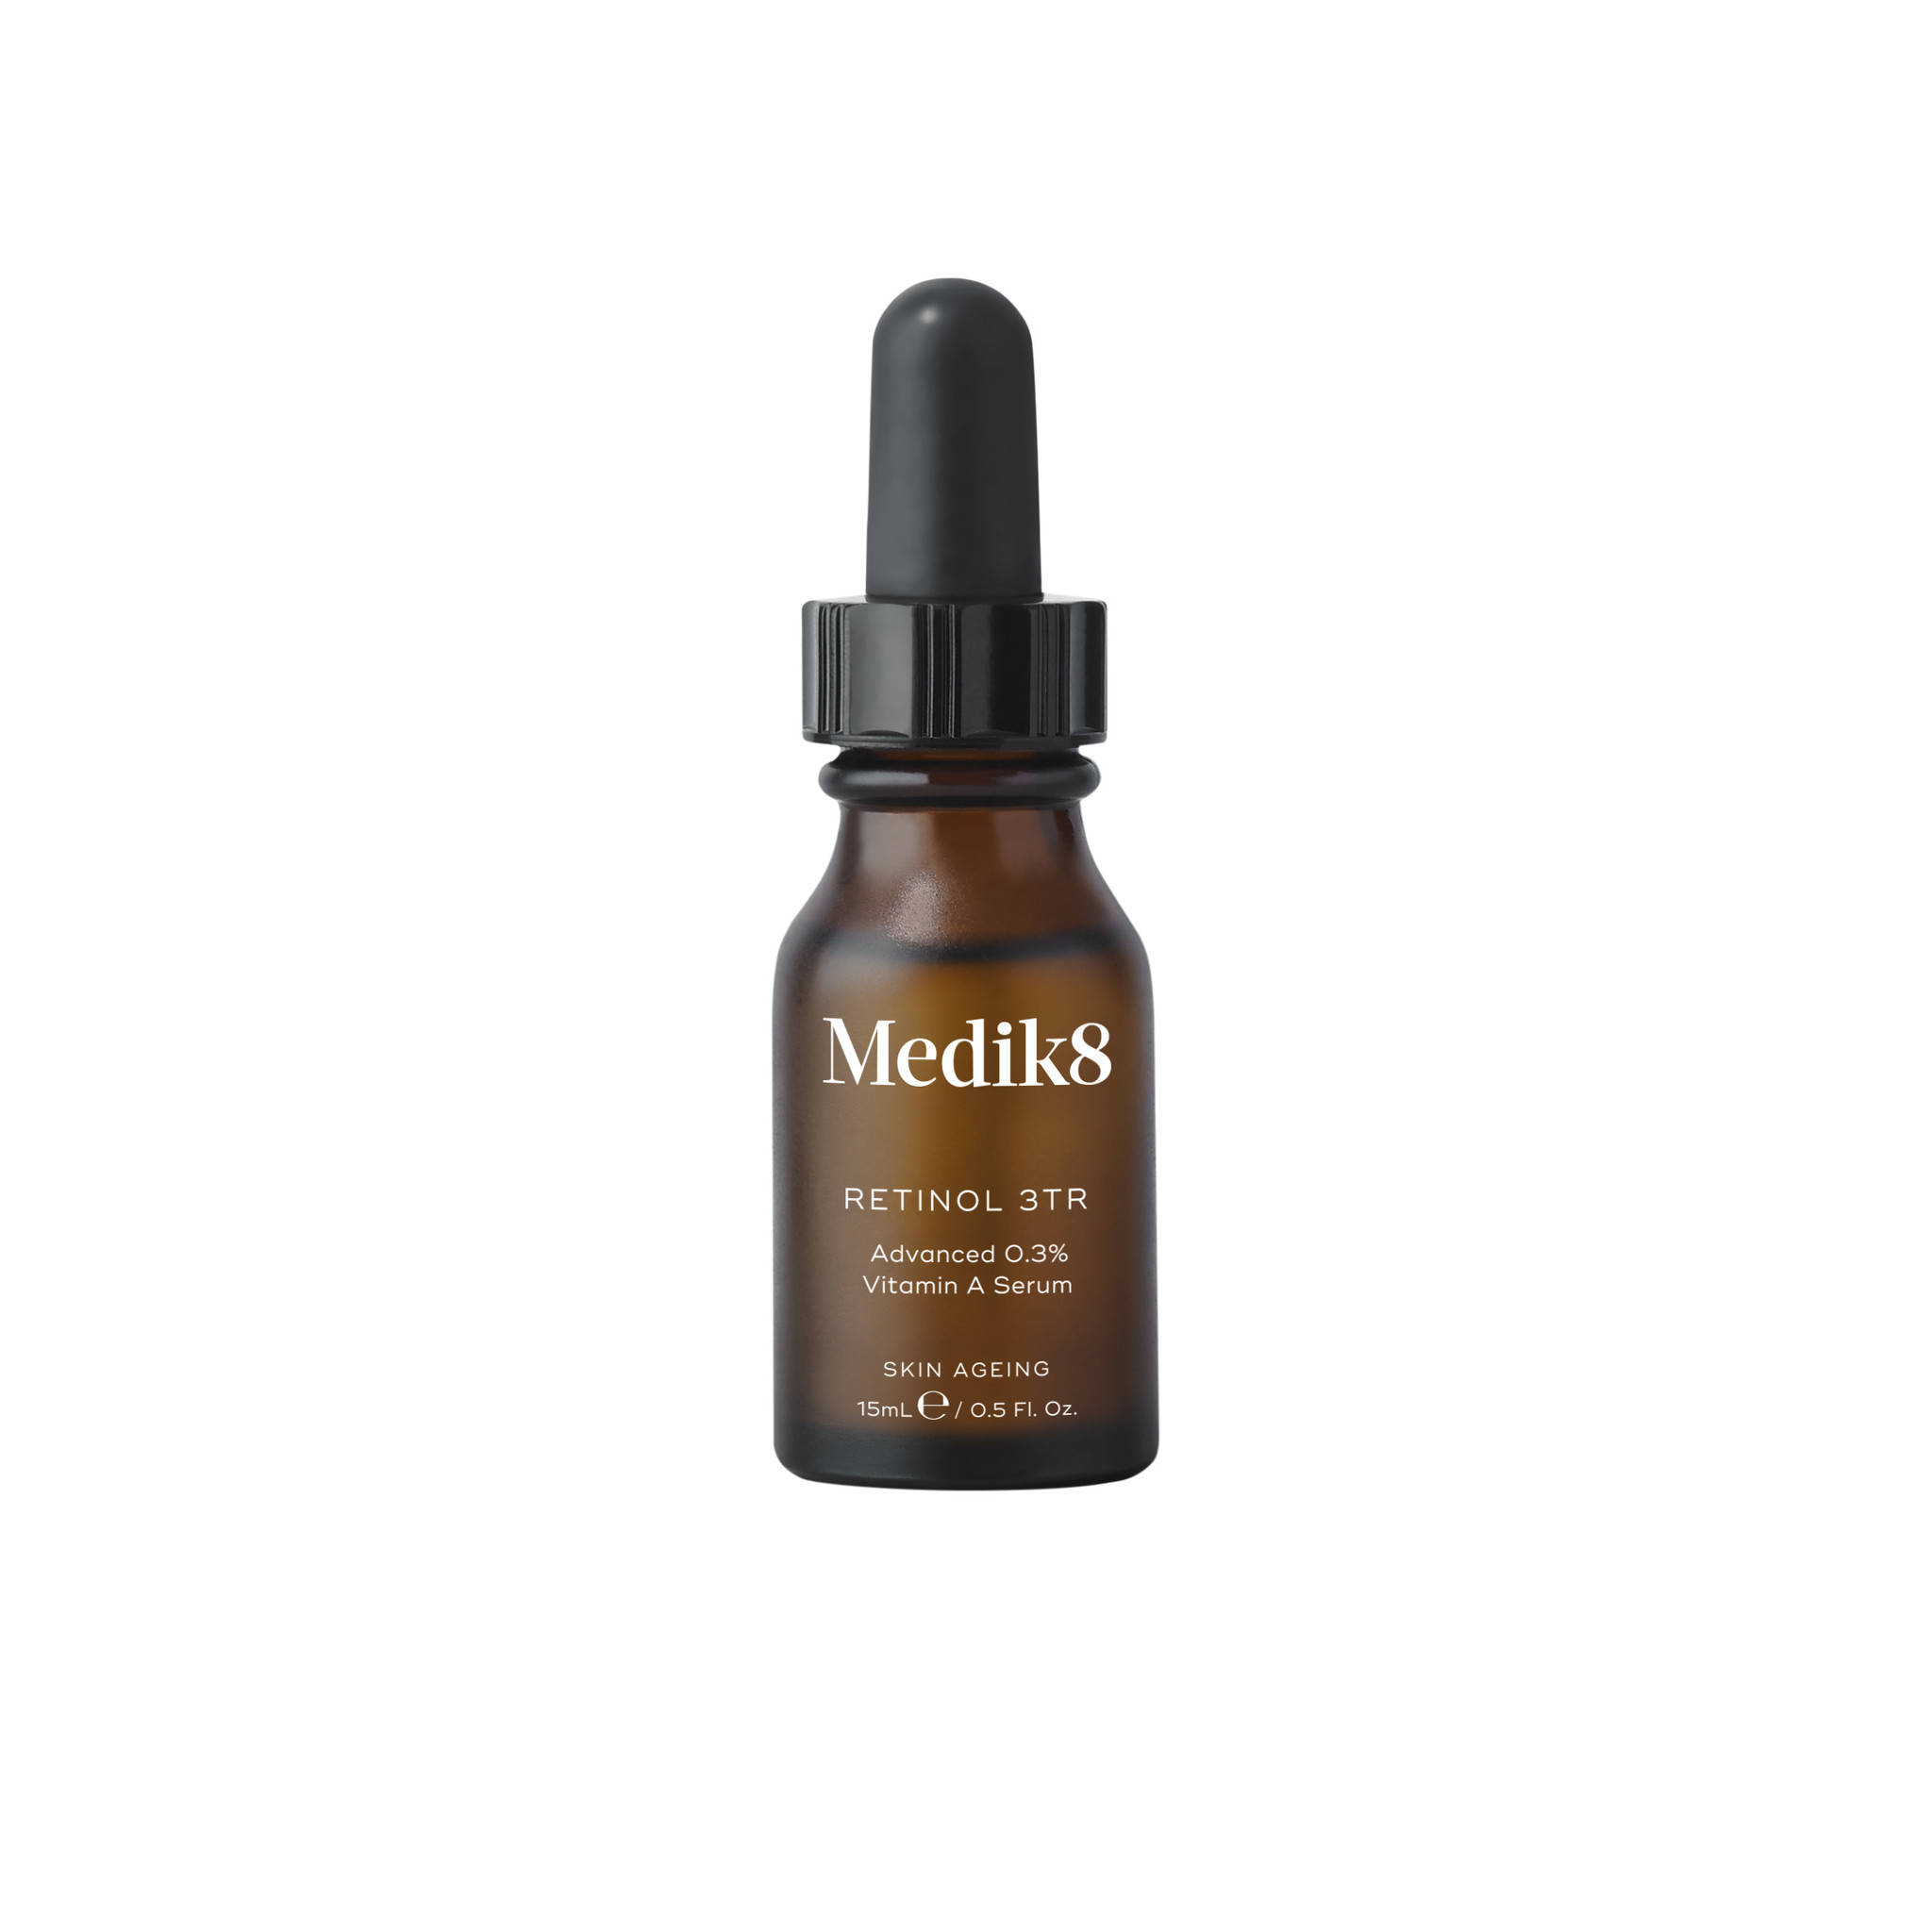 Medik8 Medik8 Retinol 3TR serum 15ml